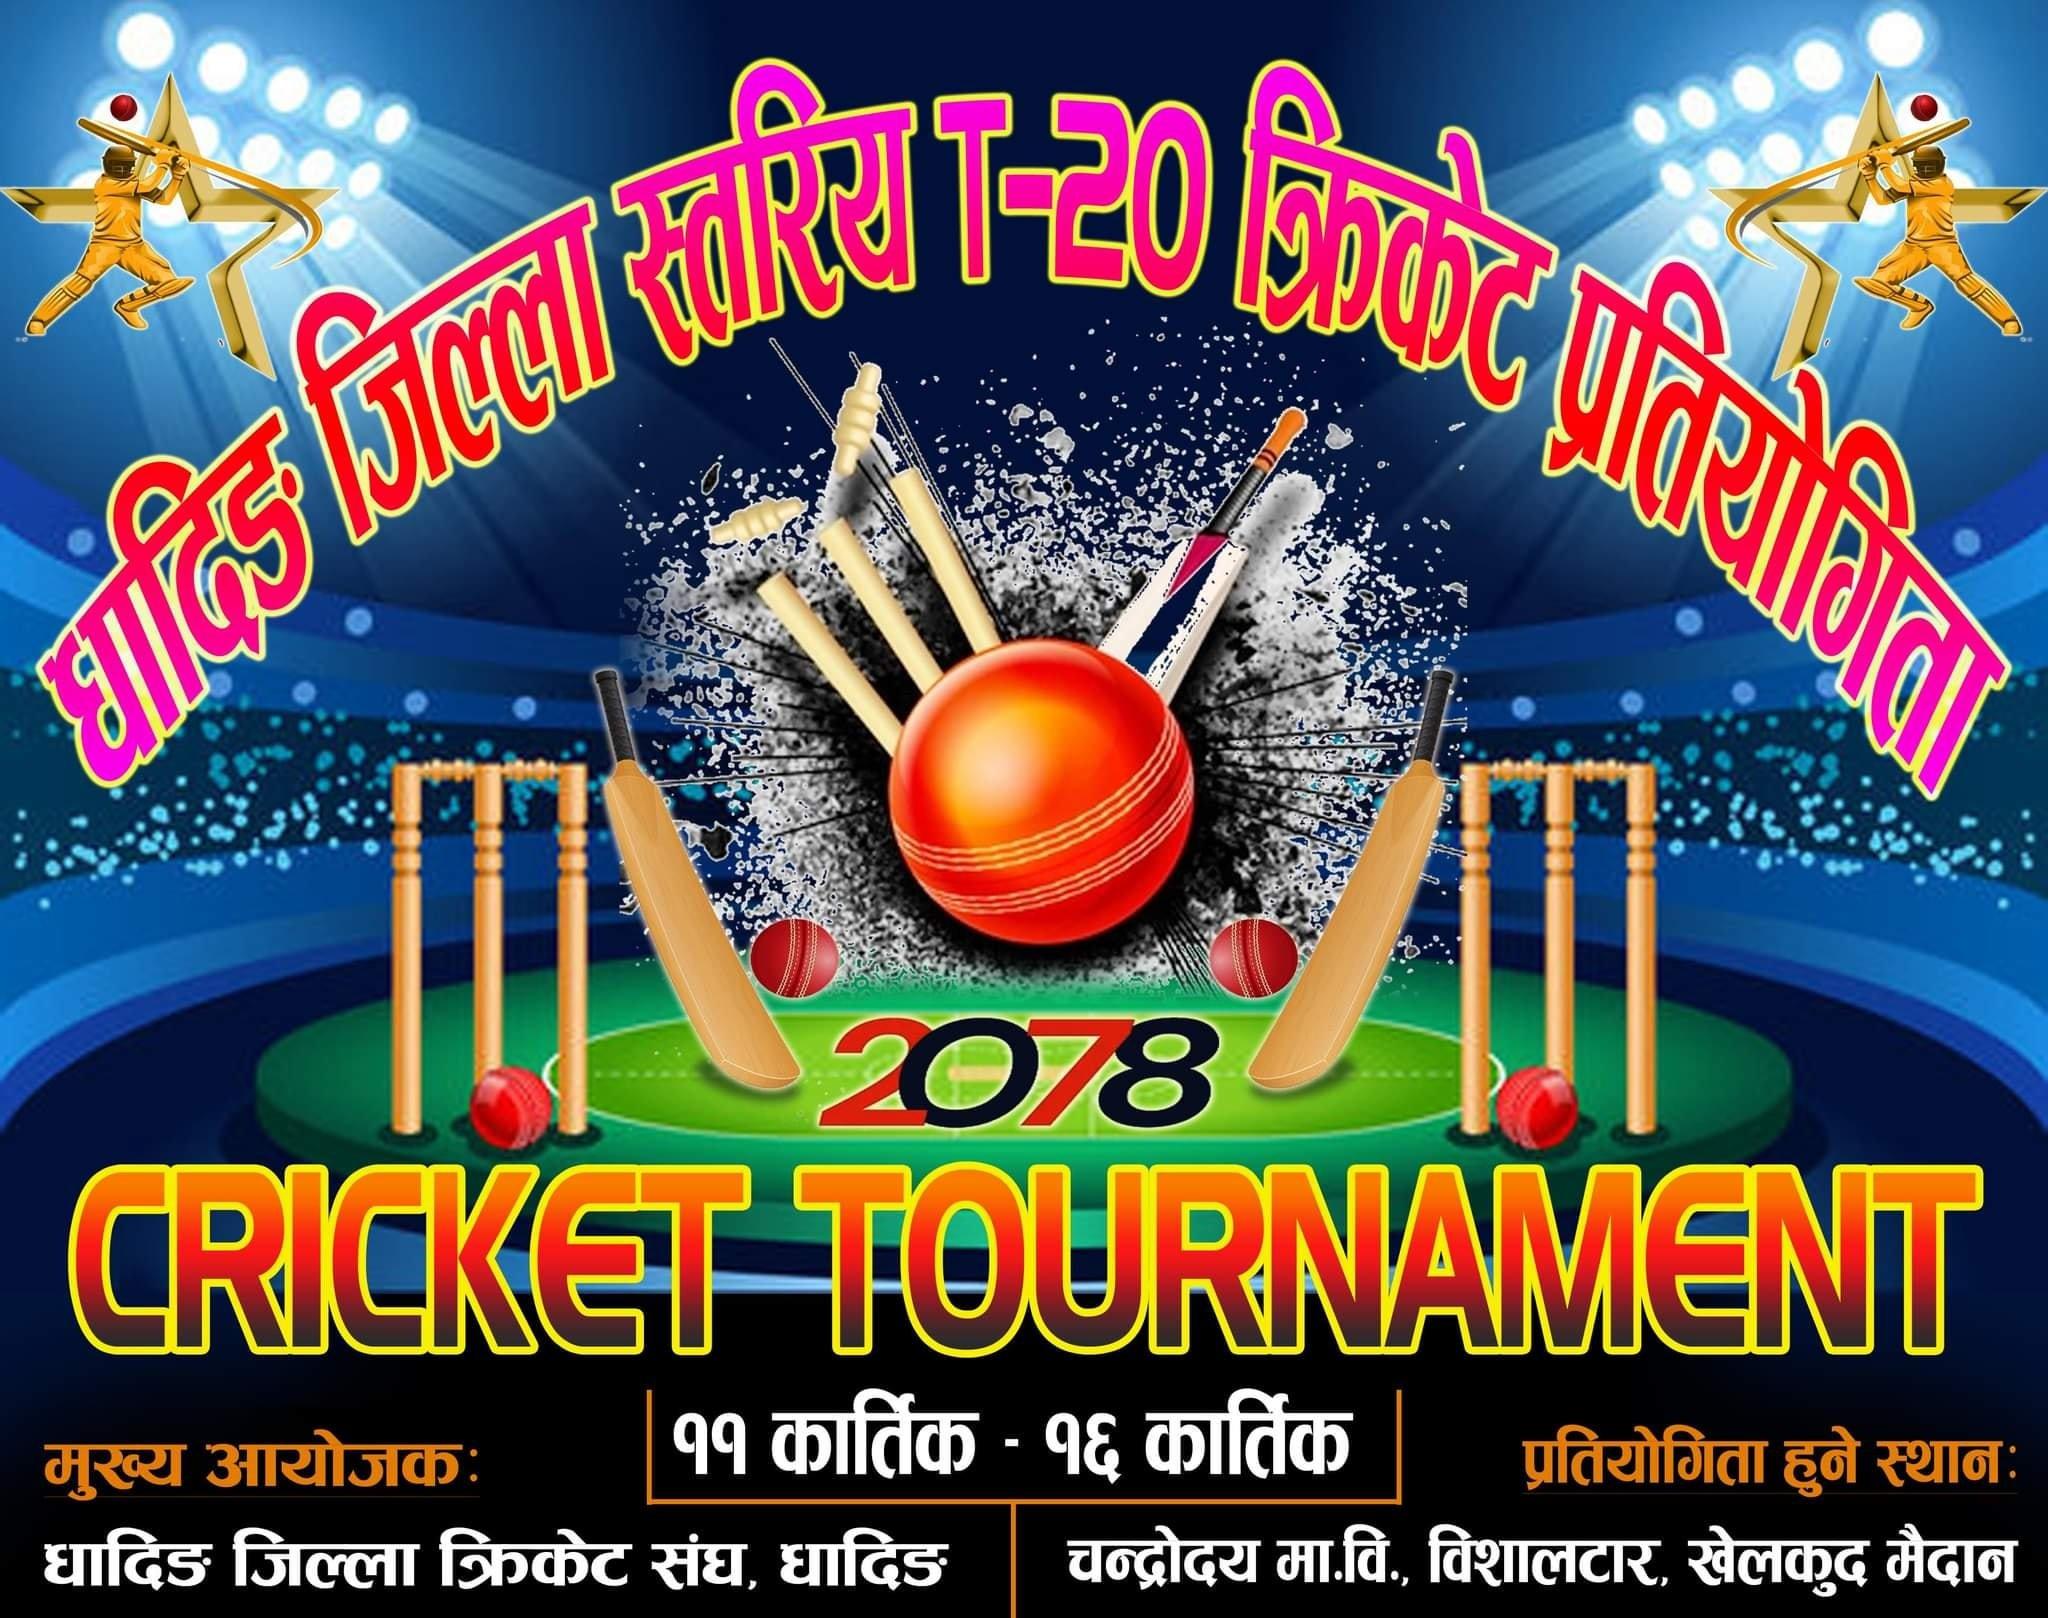 ११ गतेदेखि धादिङ जिल्ला स्तरीय टी–२० क्रिकेट प्रतियोगिता हुने